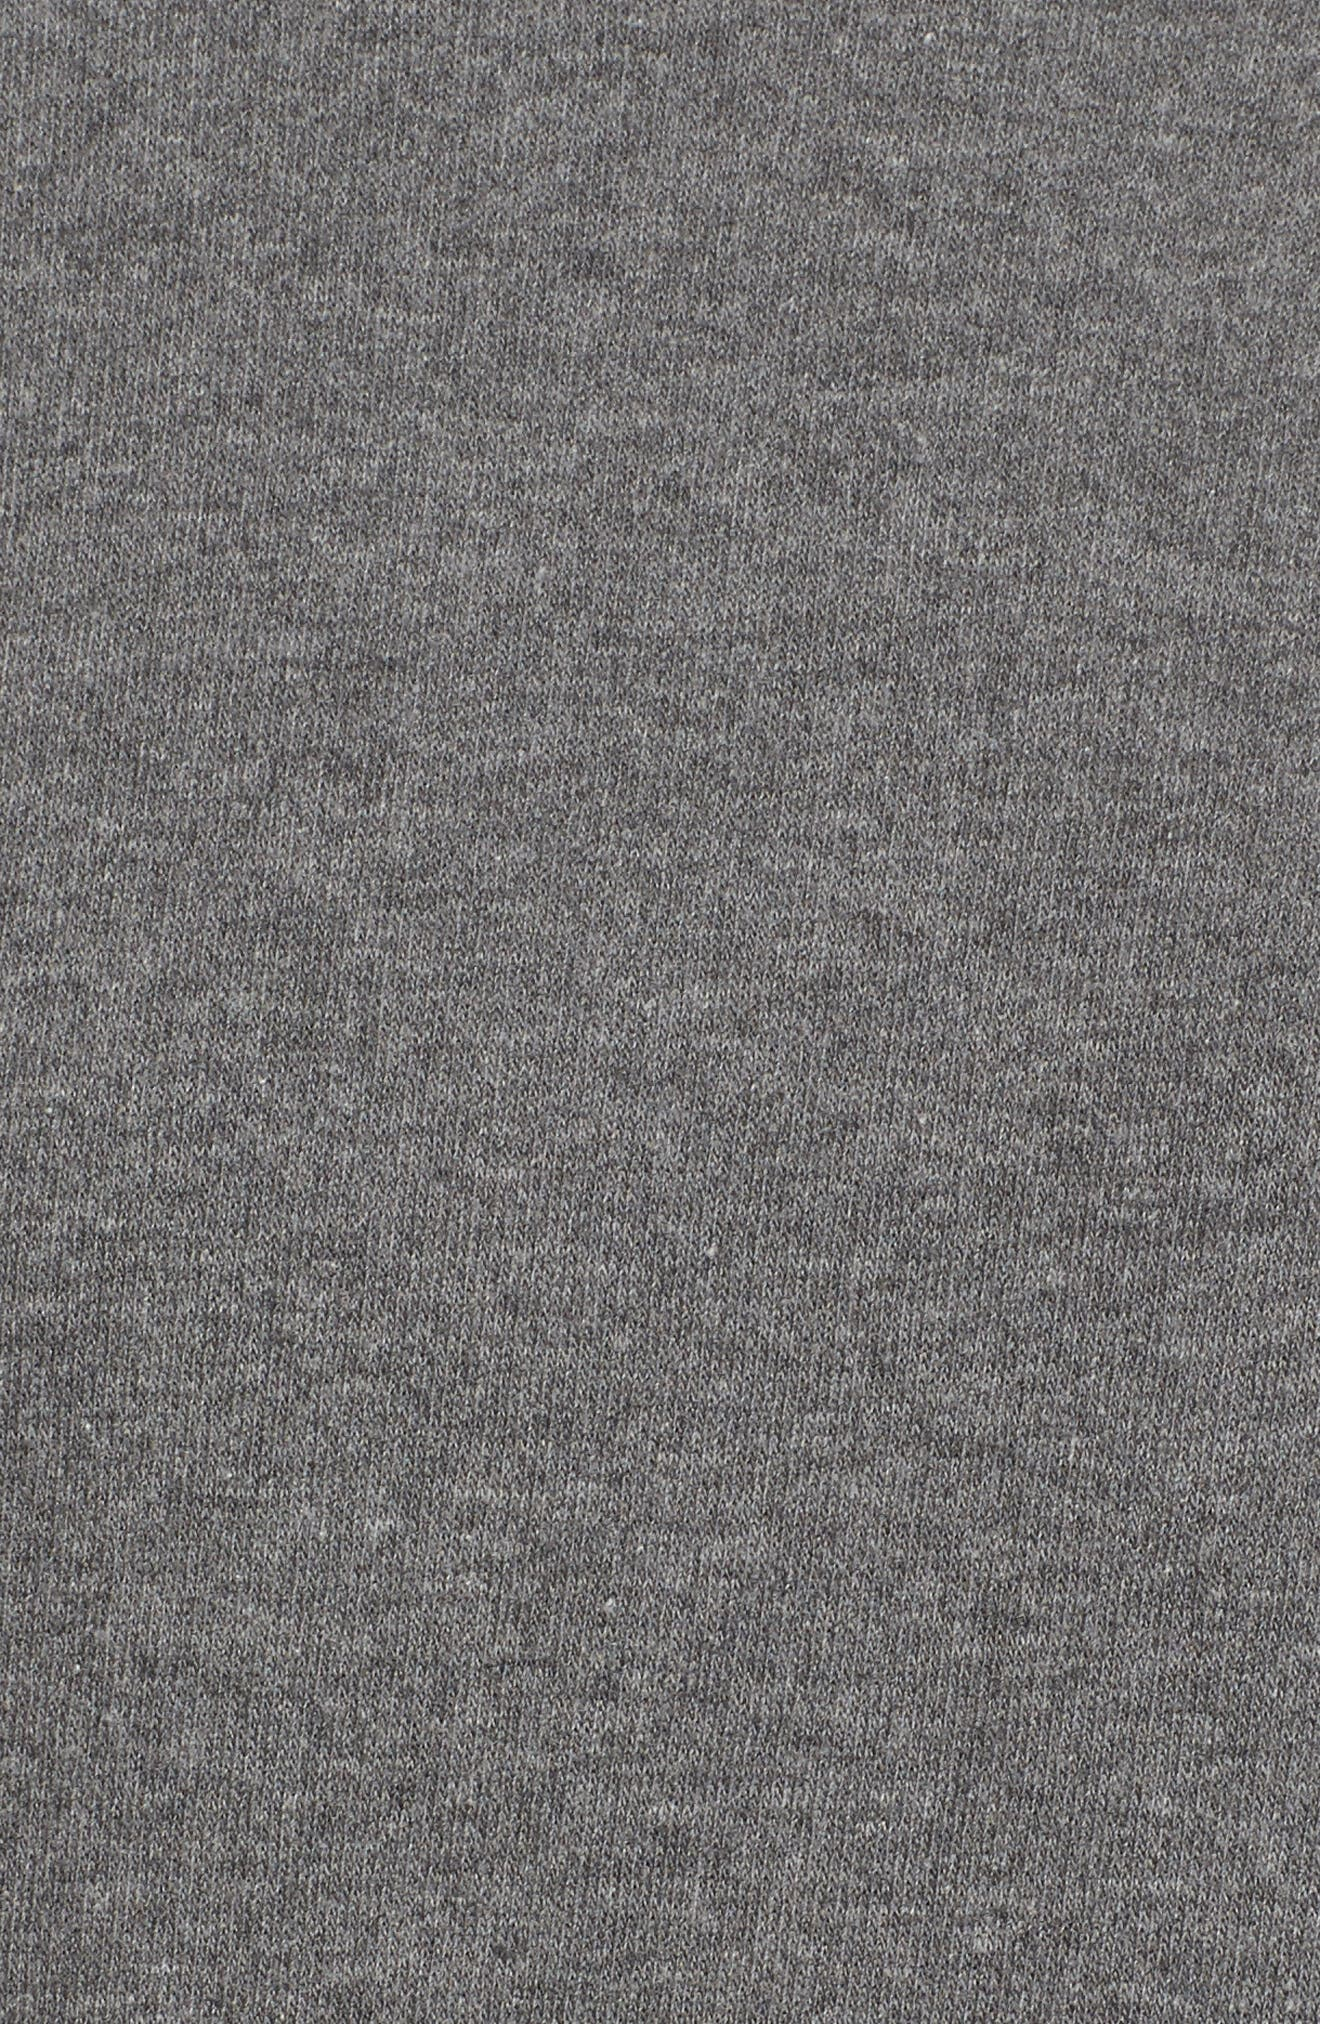 Puff Sleeve Sweatshirt,                             Alternate thumbnail 5, color,                             020